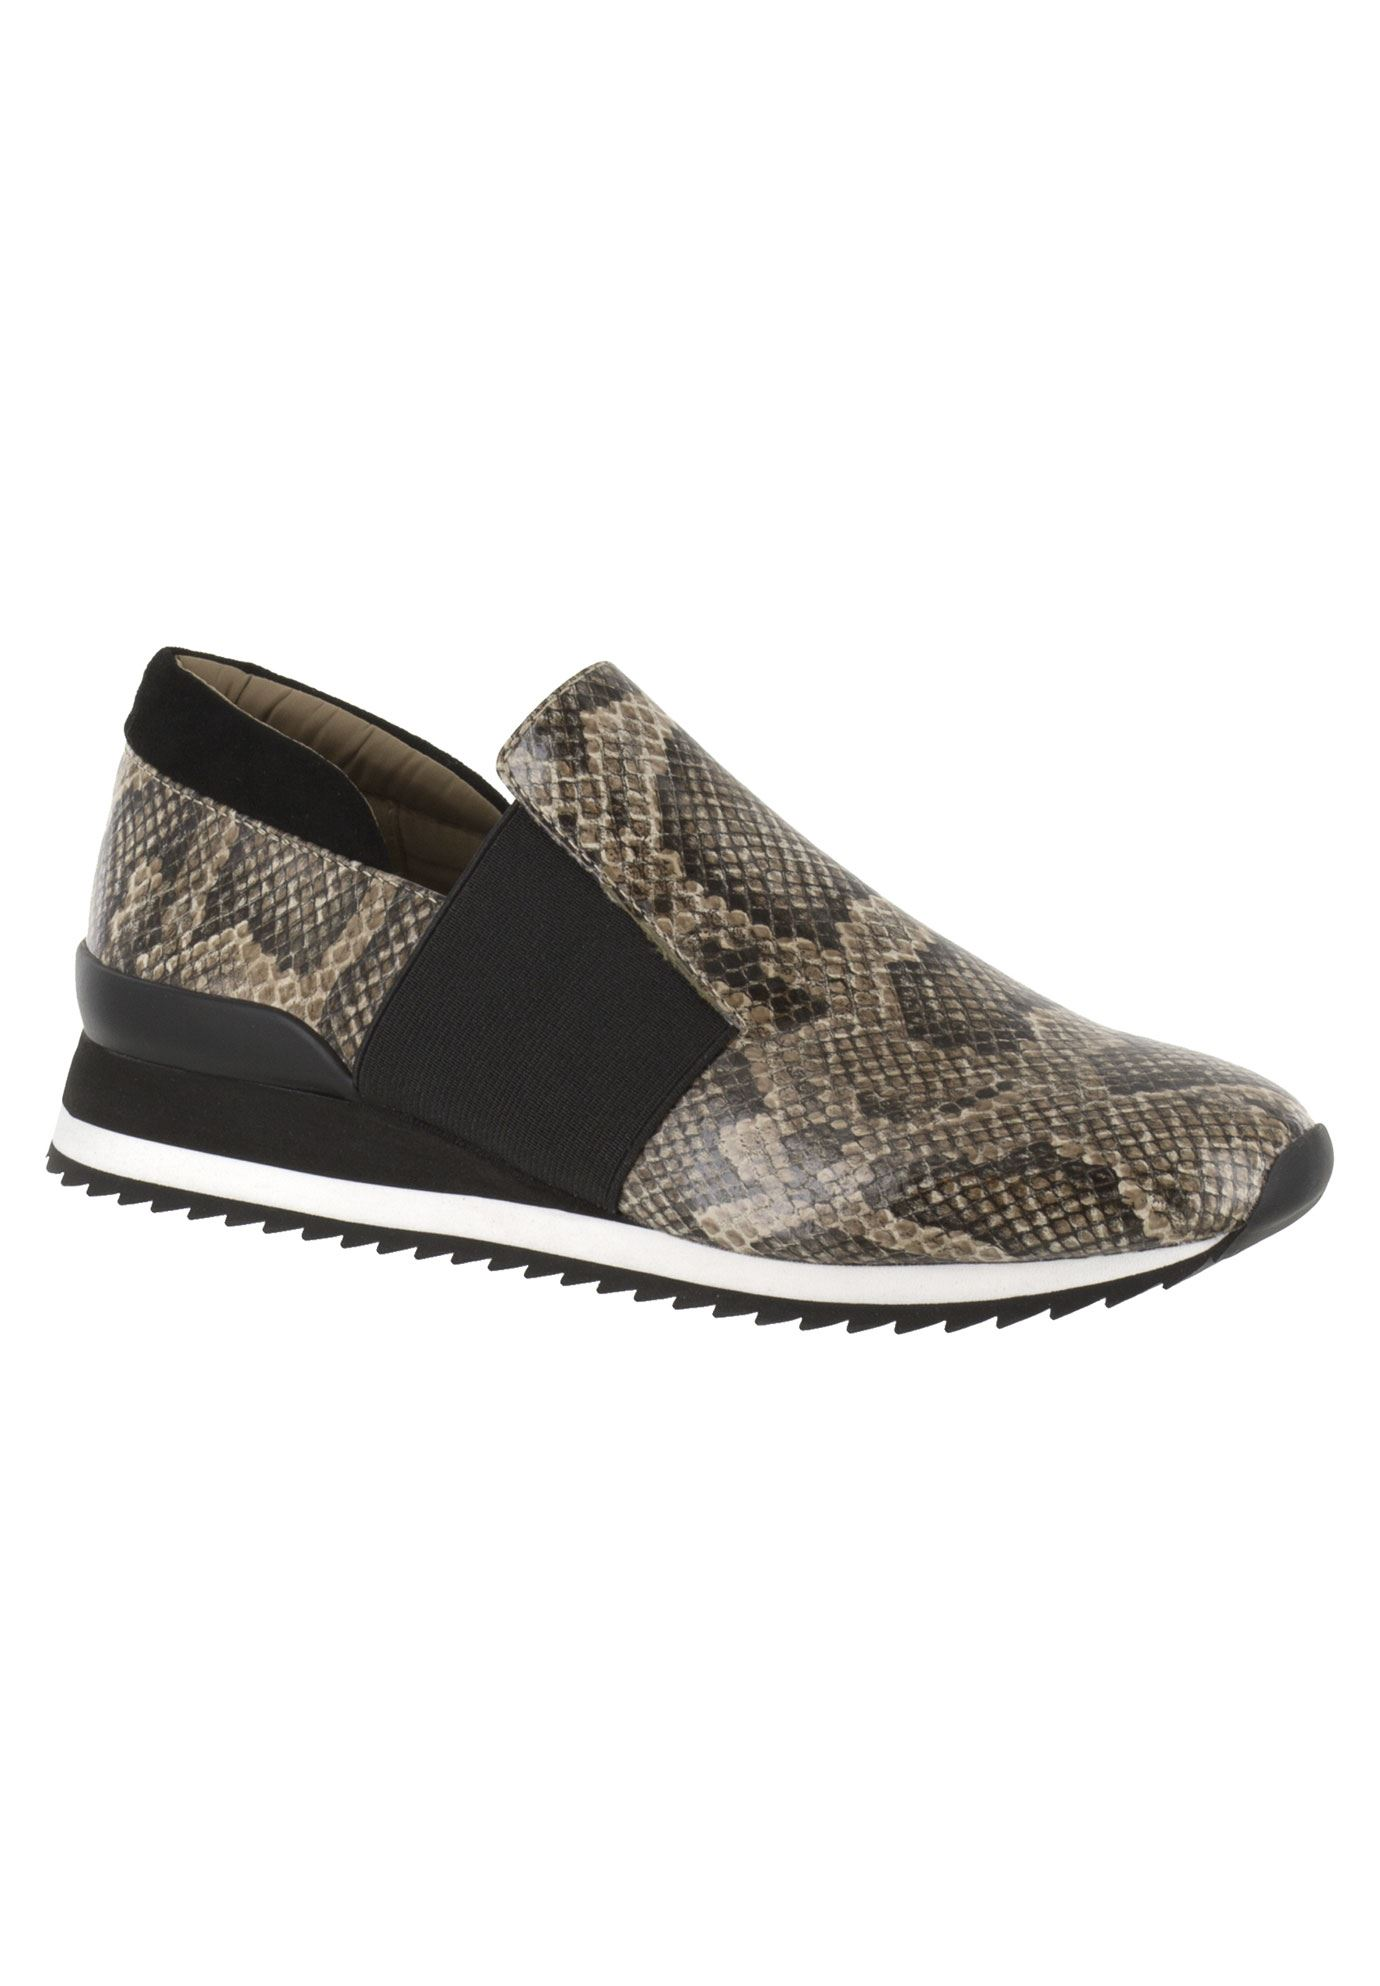 Ezra Brand Shoes